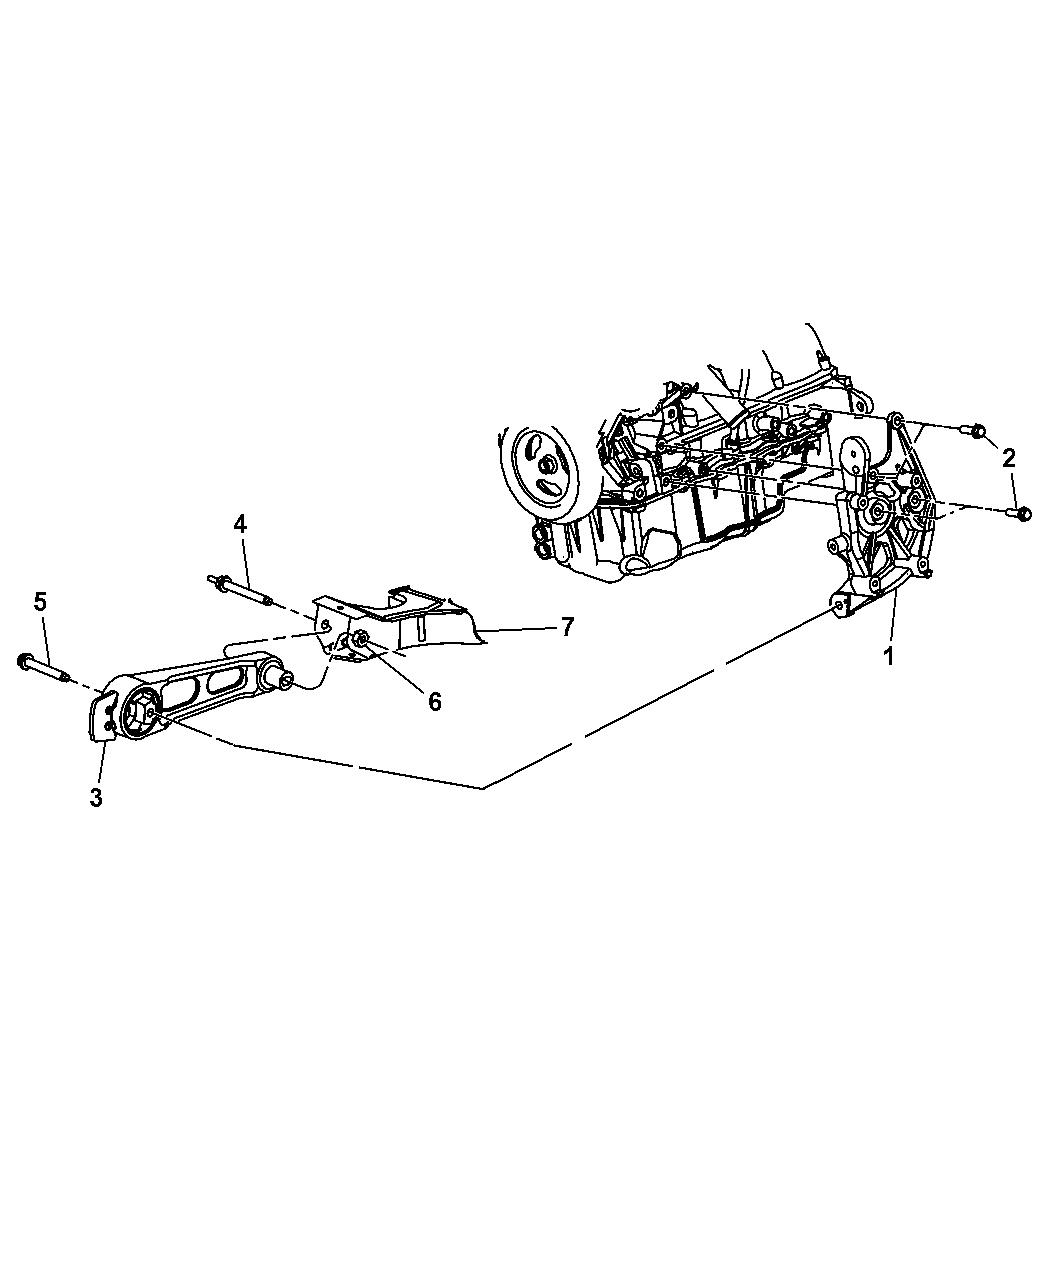 2009 Chrysler Pt Cruiser Engine Mounting Mopar Parts Giant Diagram Thumbnail 1